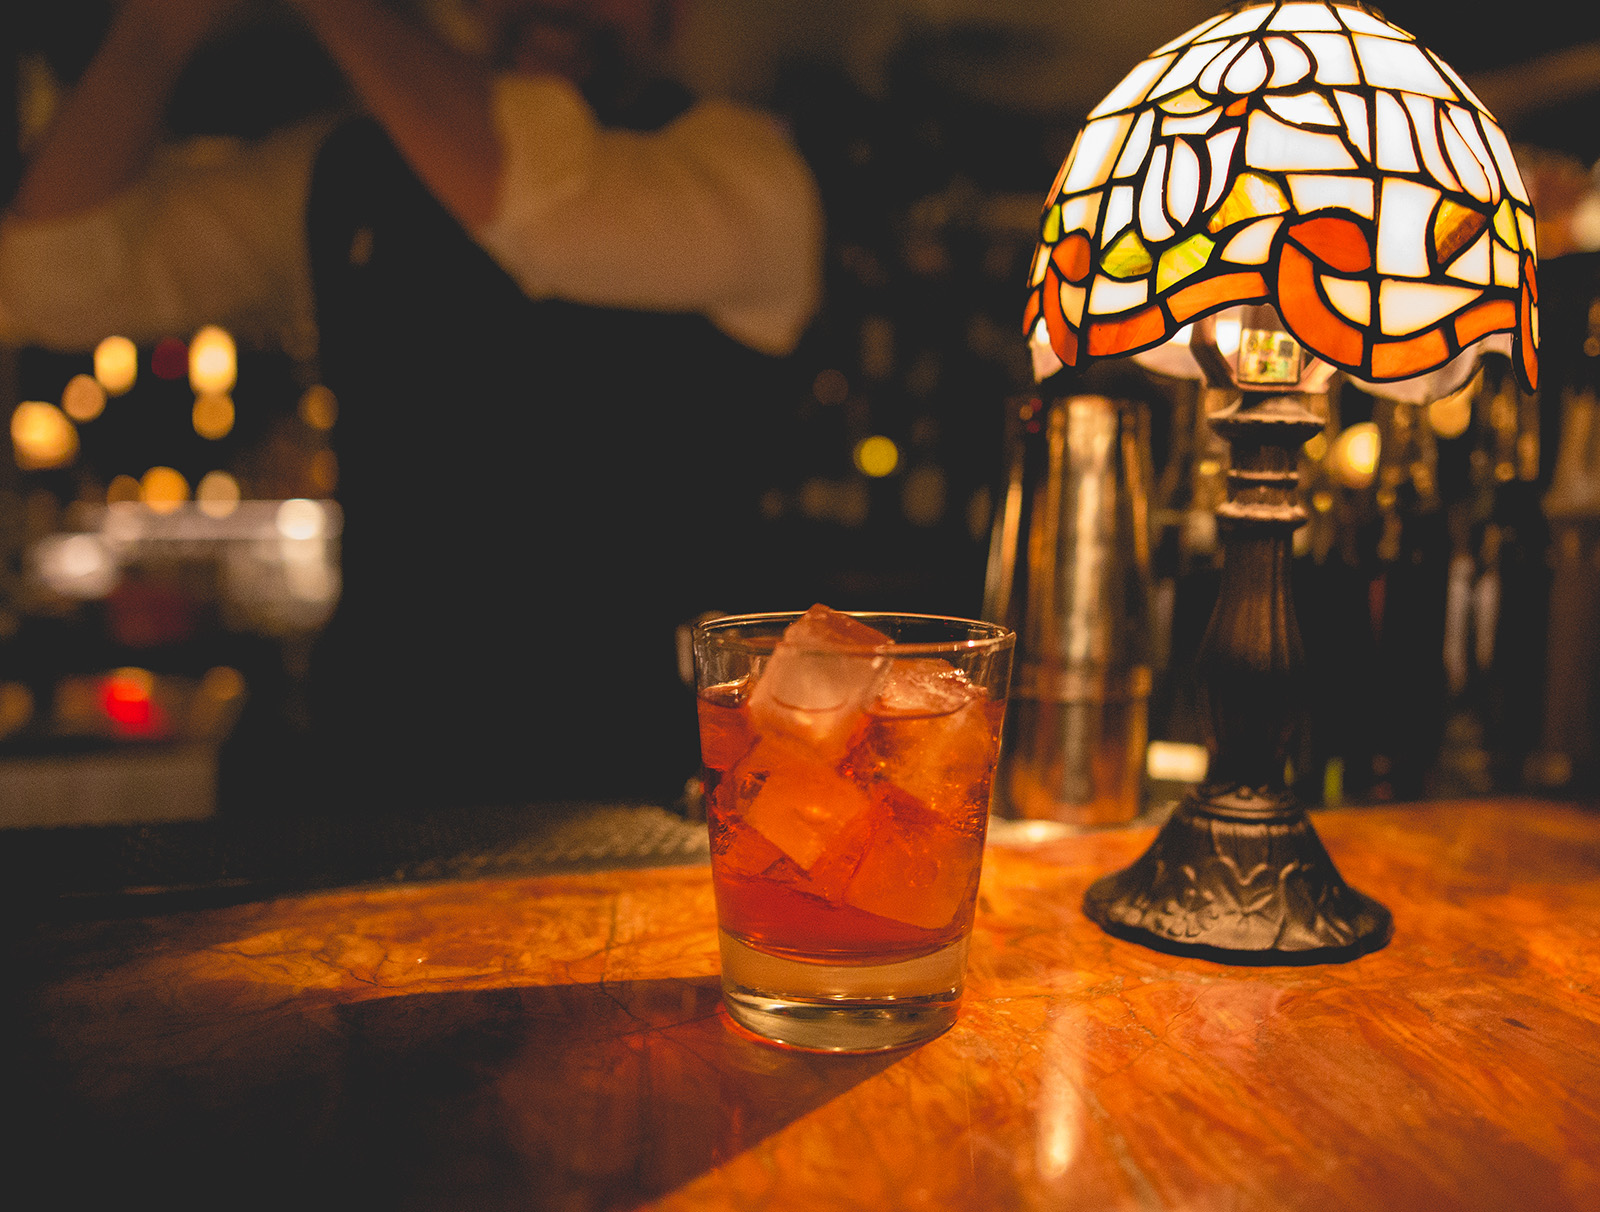 LV cocktail lamp